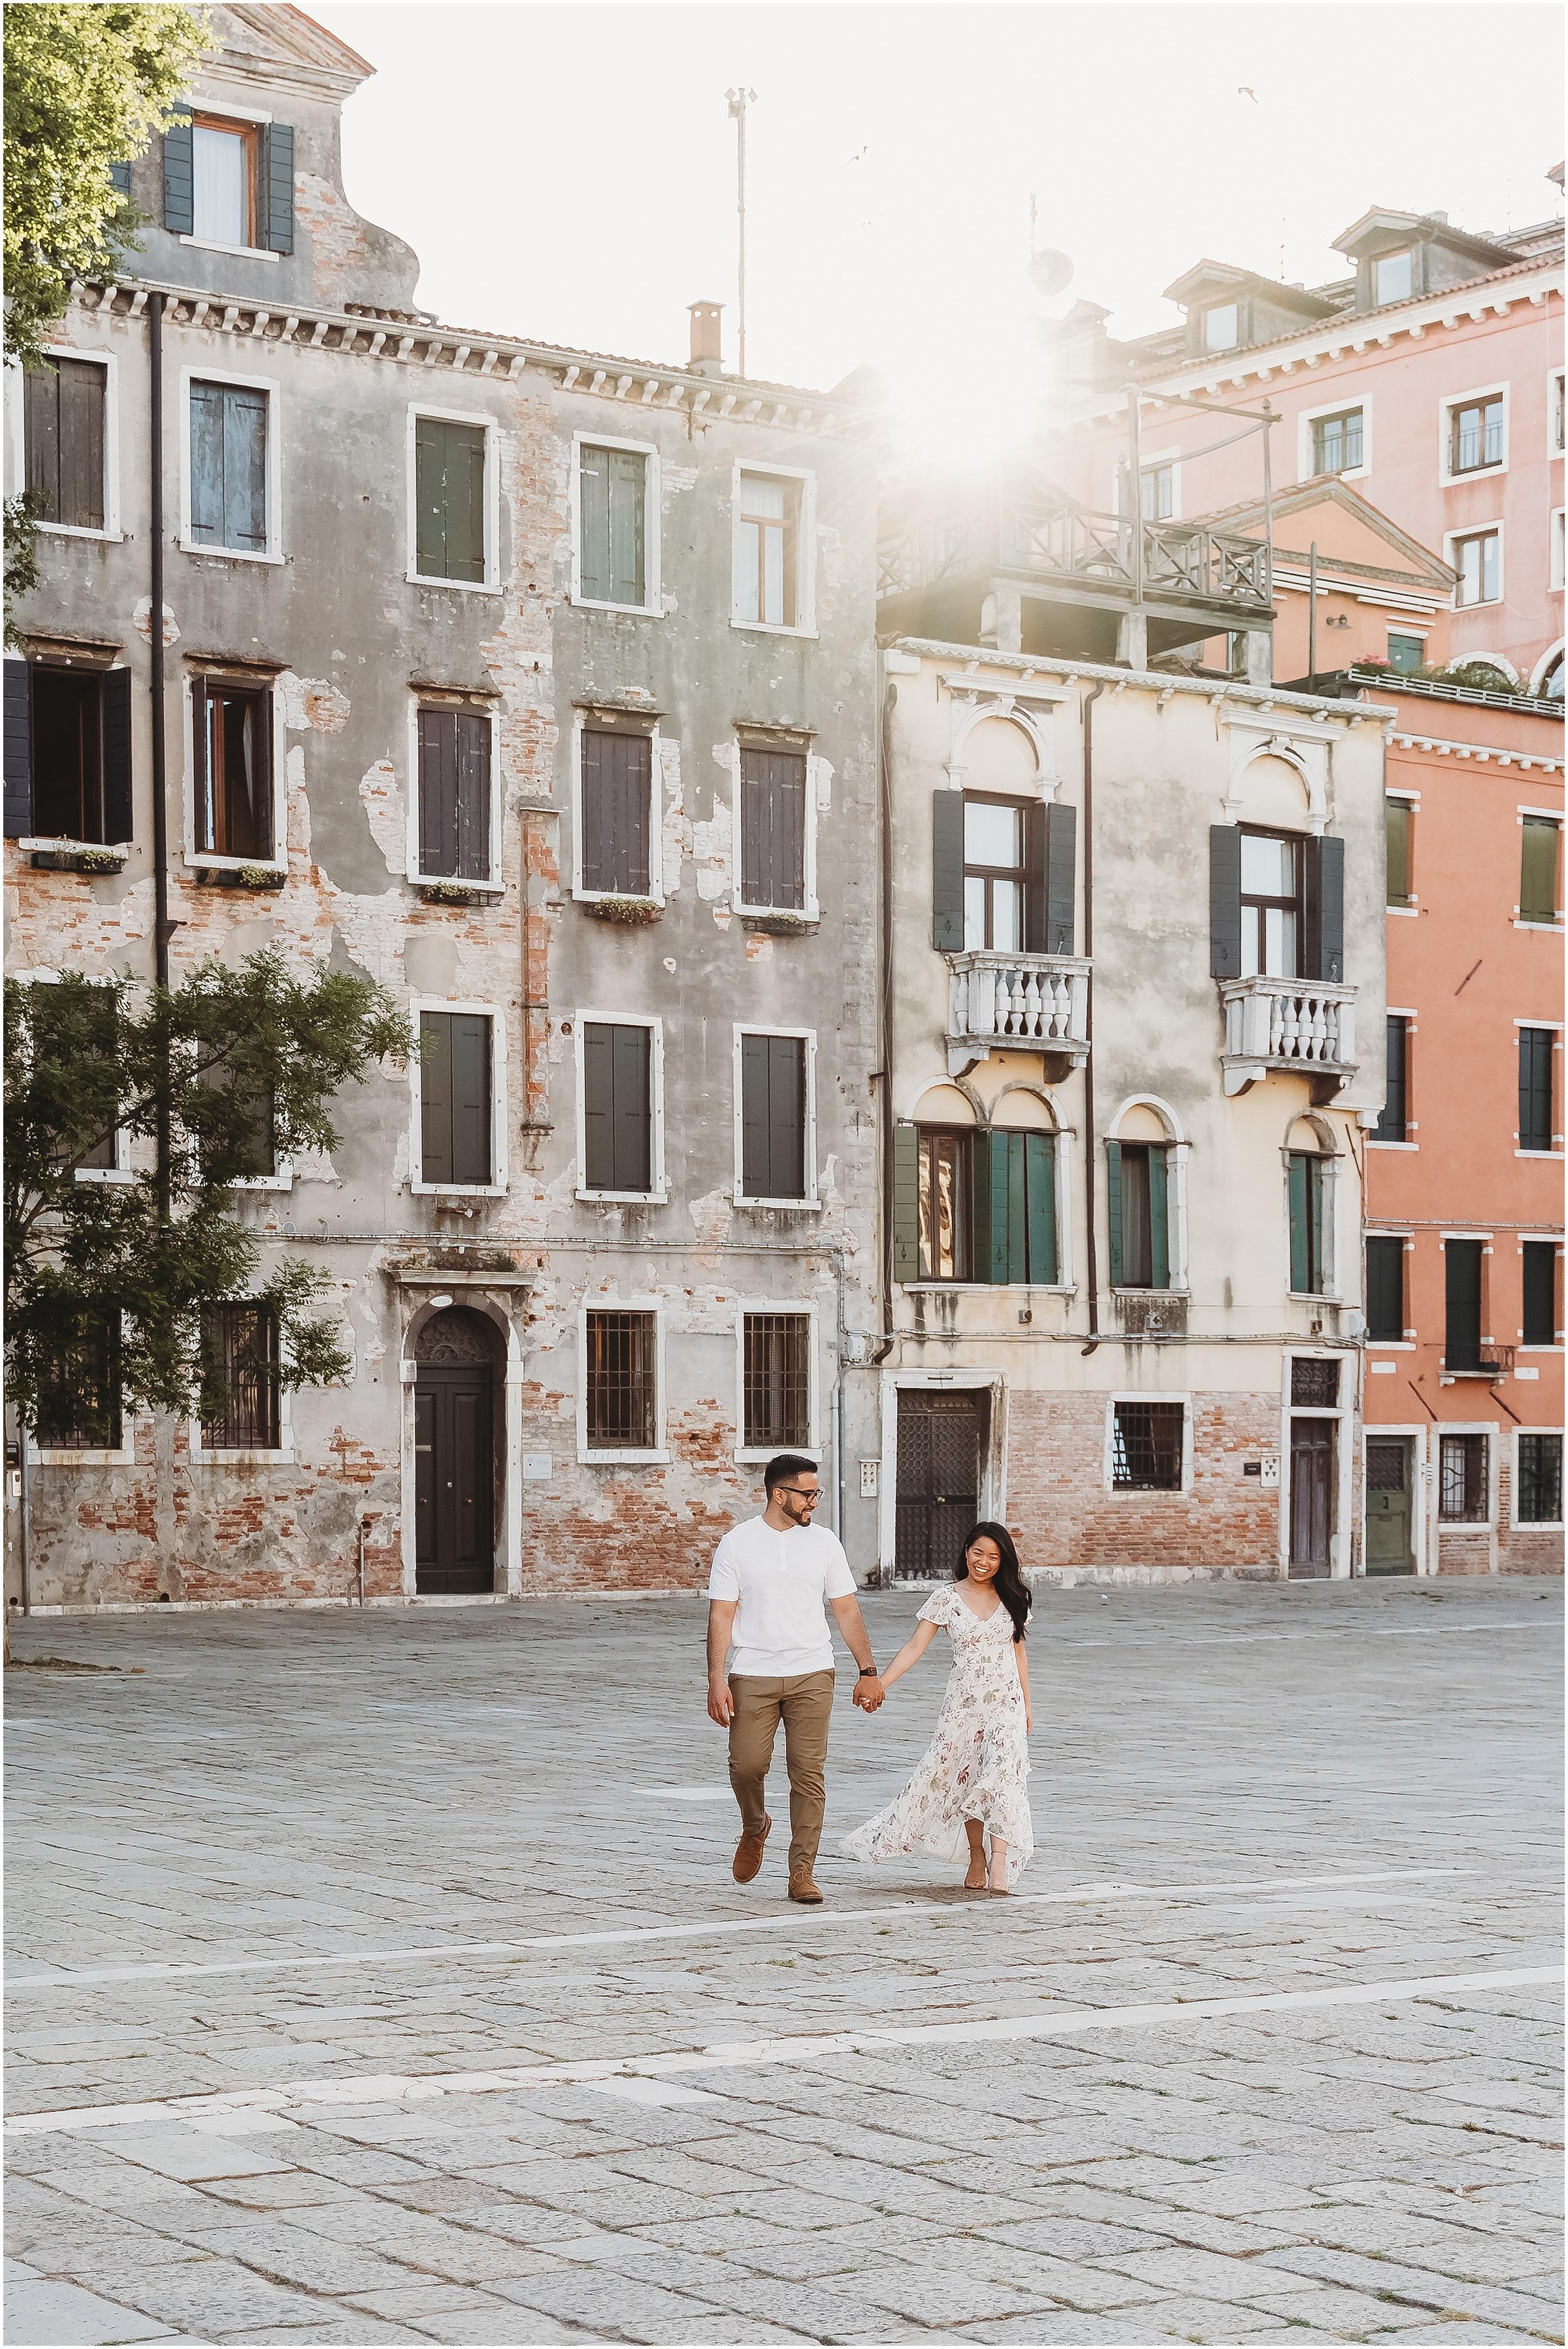 photographer-in-venice-elopement-shooting-Venice-couple_02.jpg